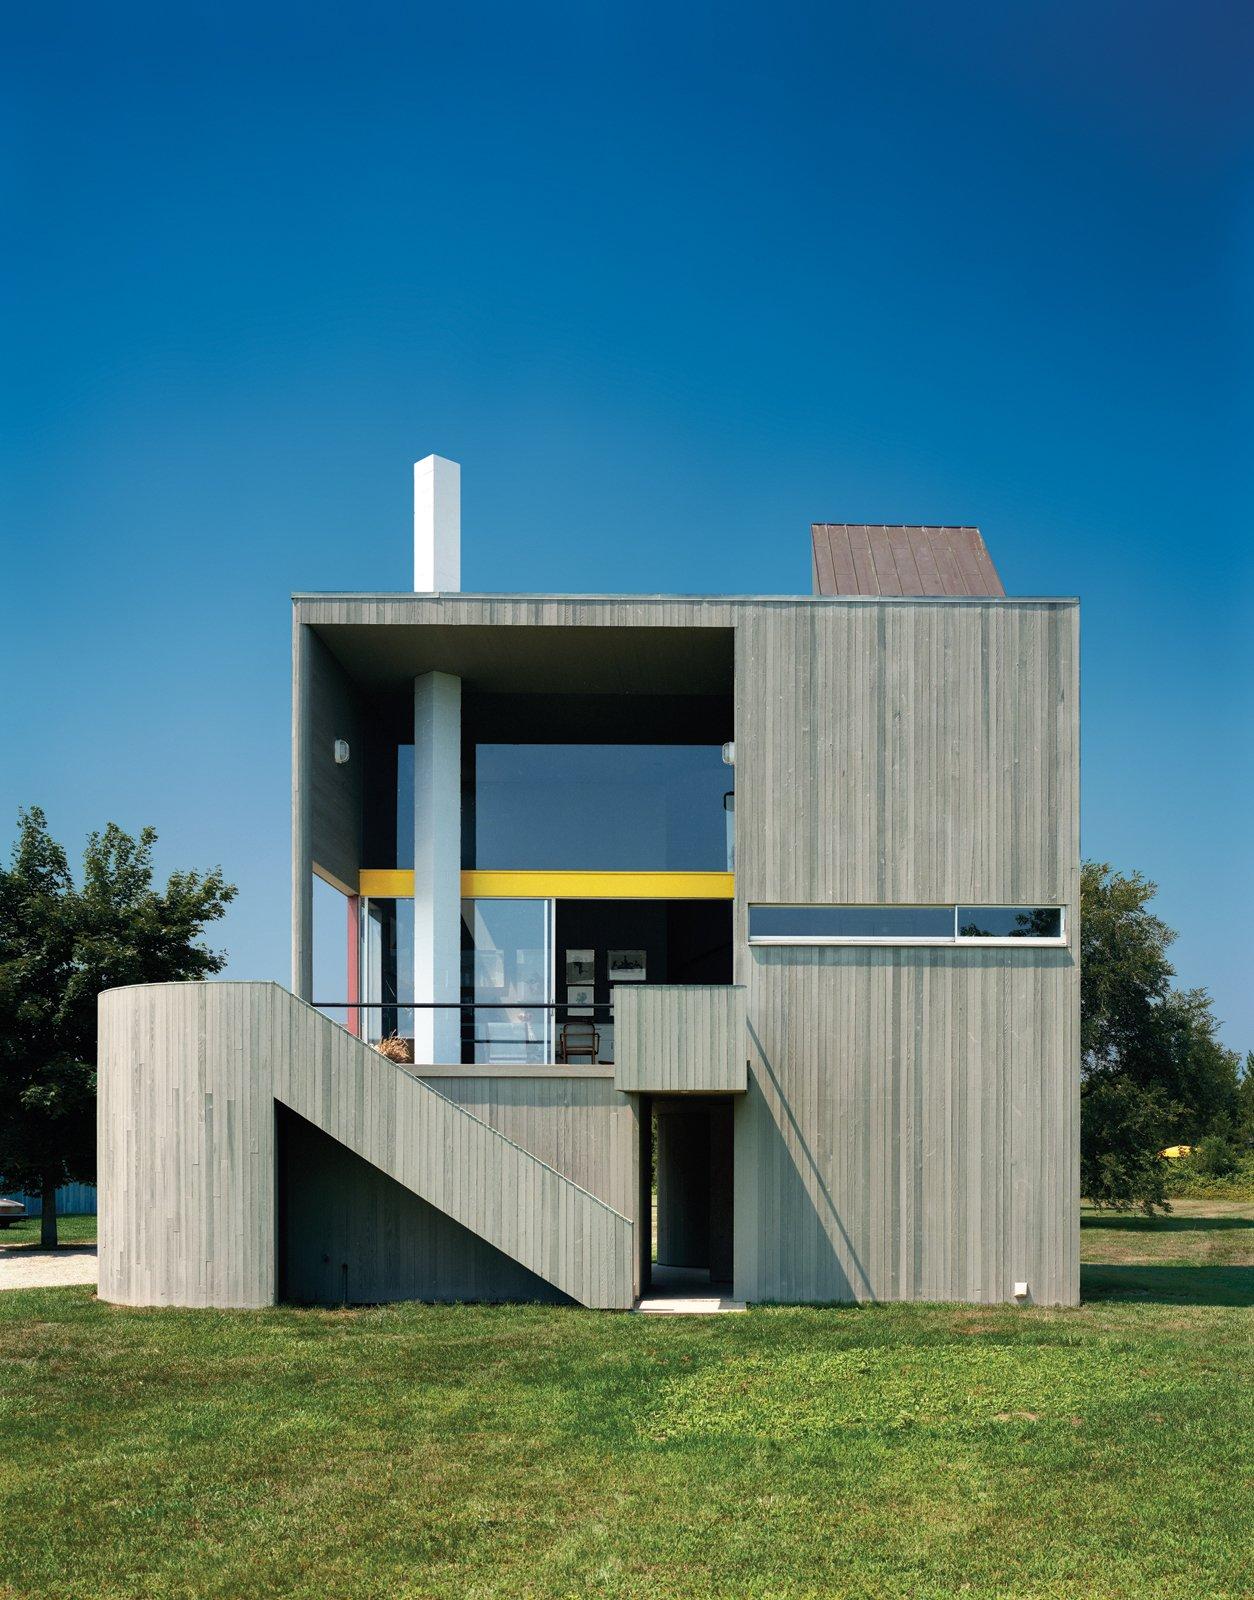 Articles about modernist angular residence vertical cedar siding on Dwell.com